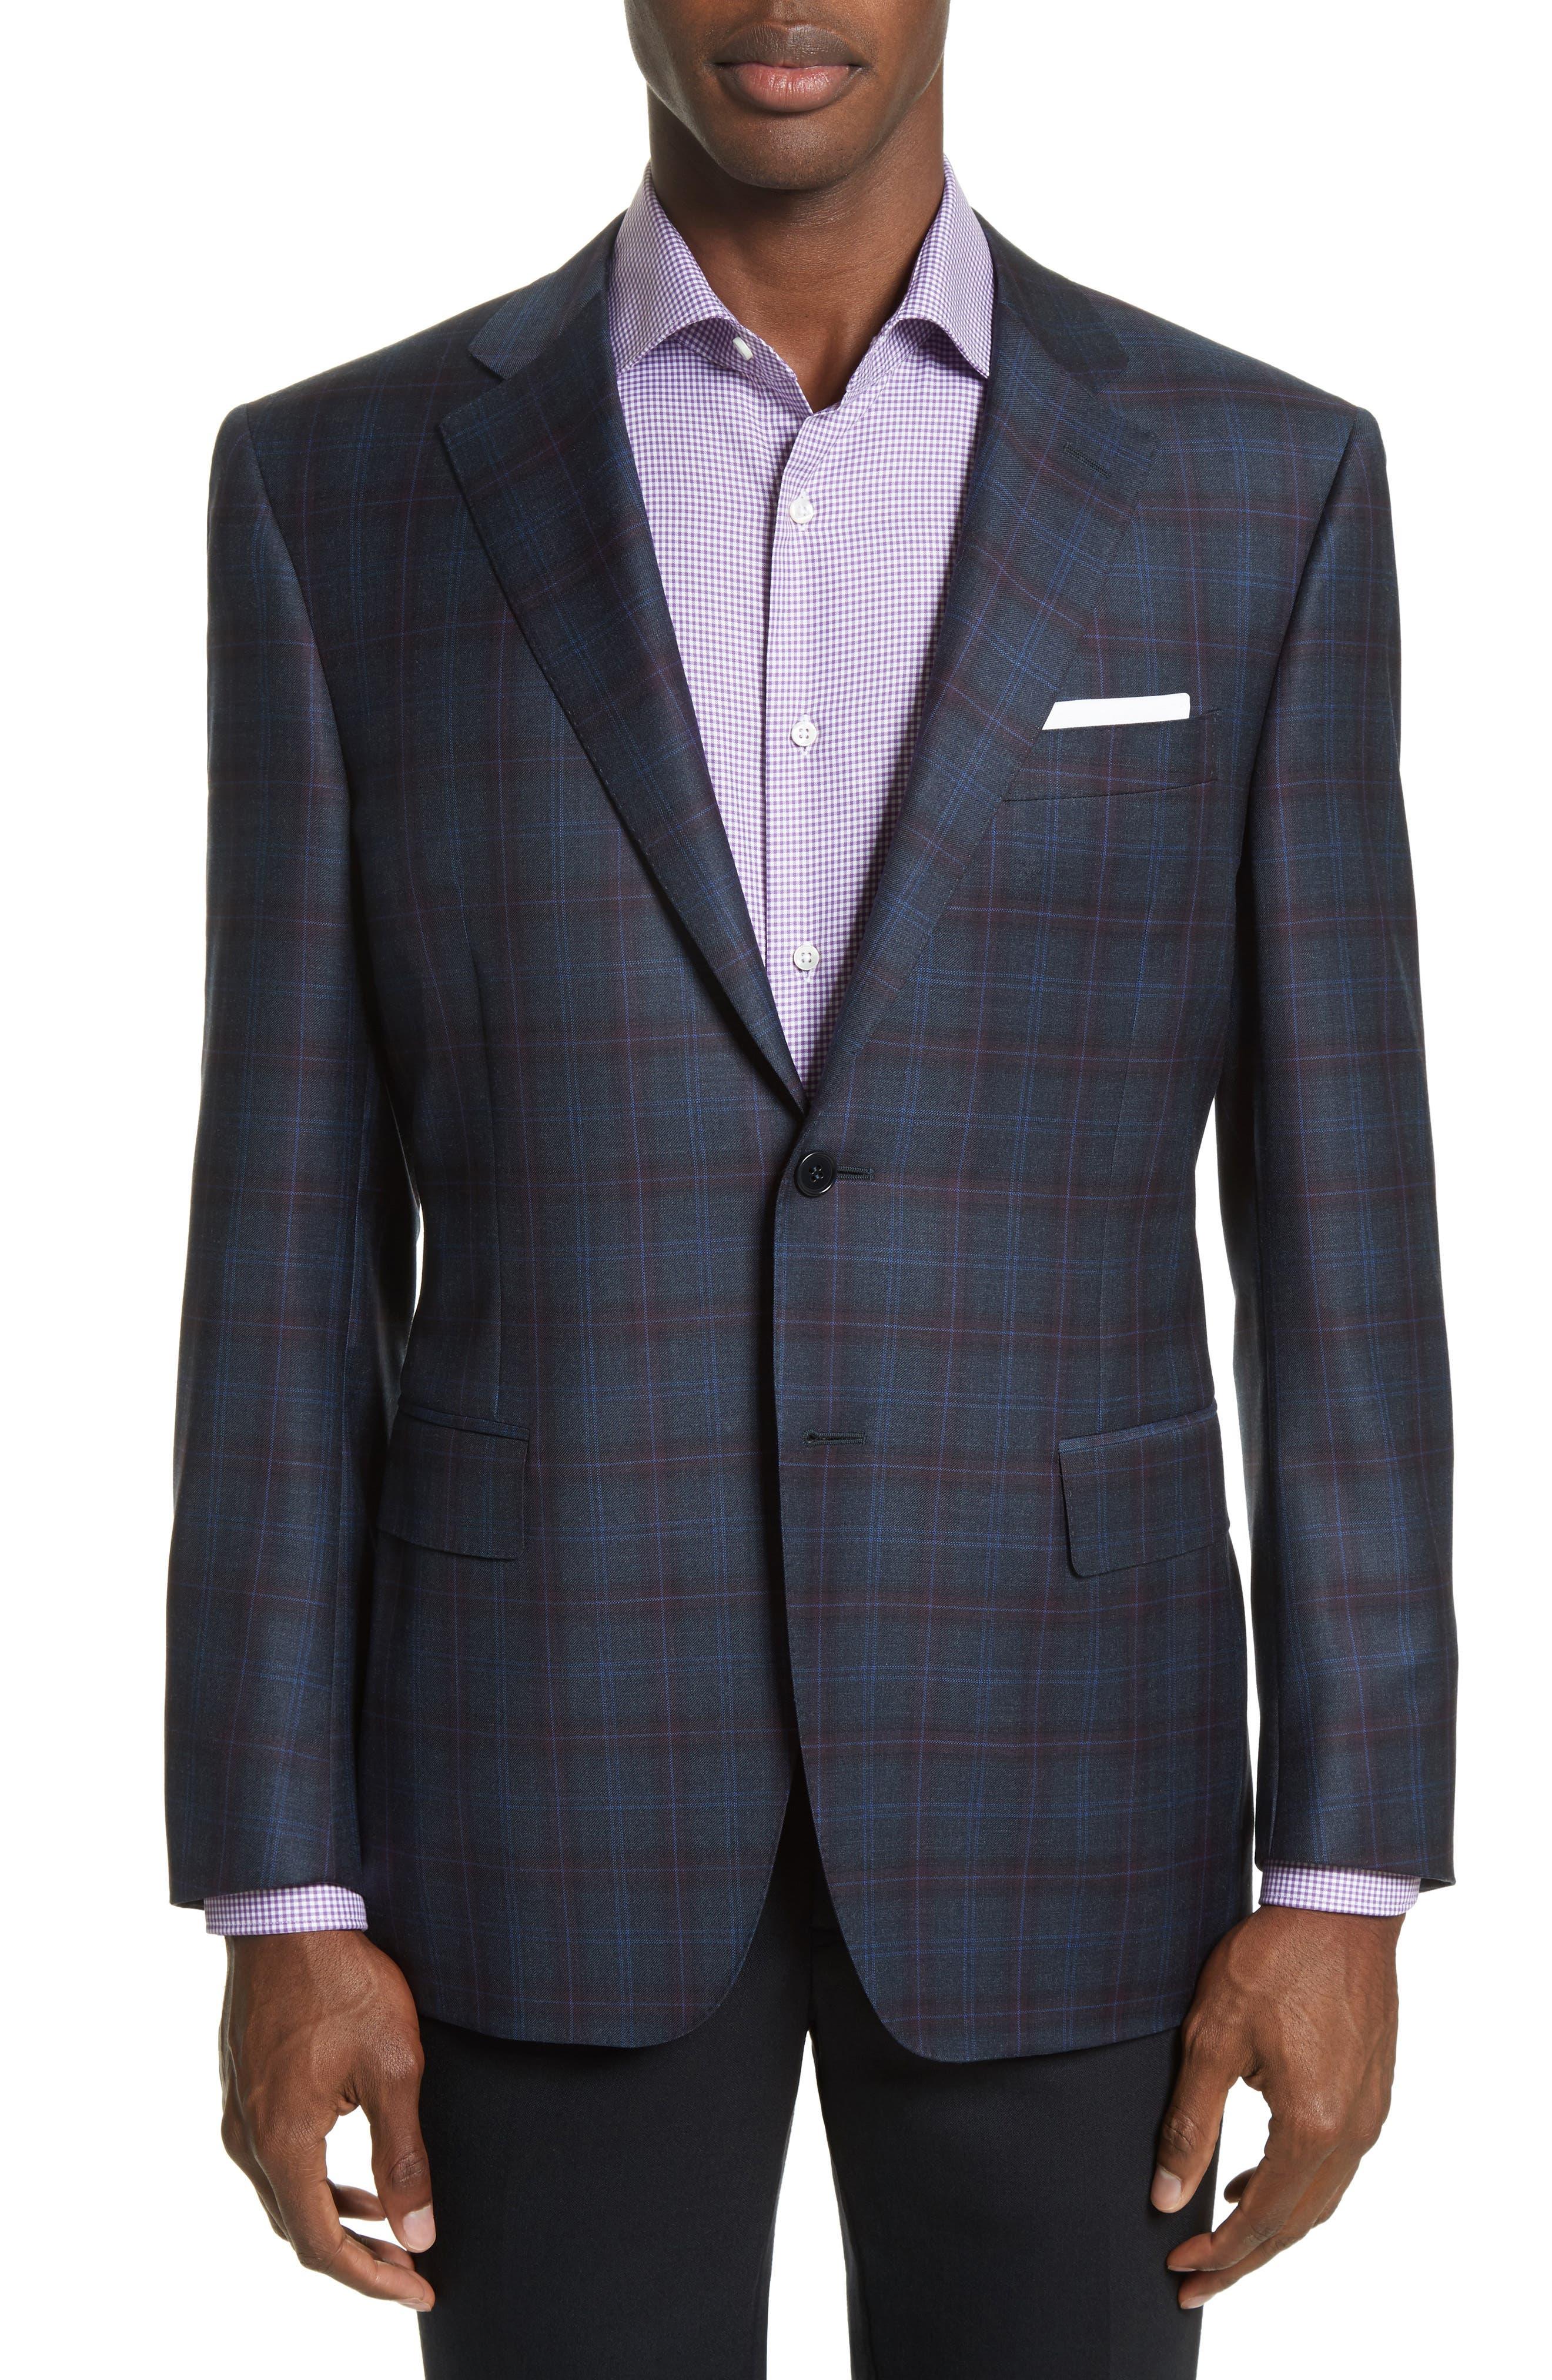 Alternate Image 1 Selected - Canali Kei Classic Fit Plaid Wool Sport Coat